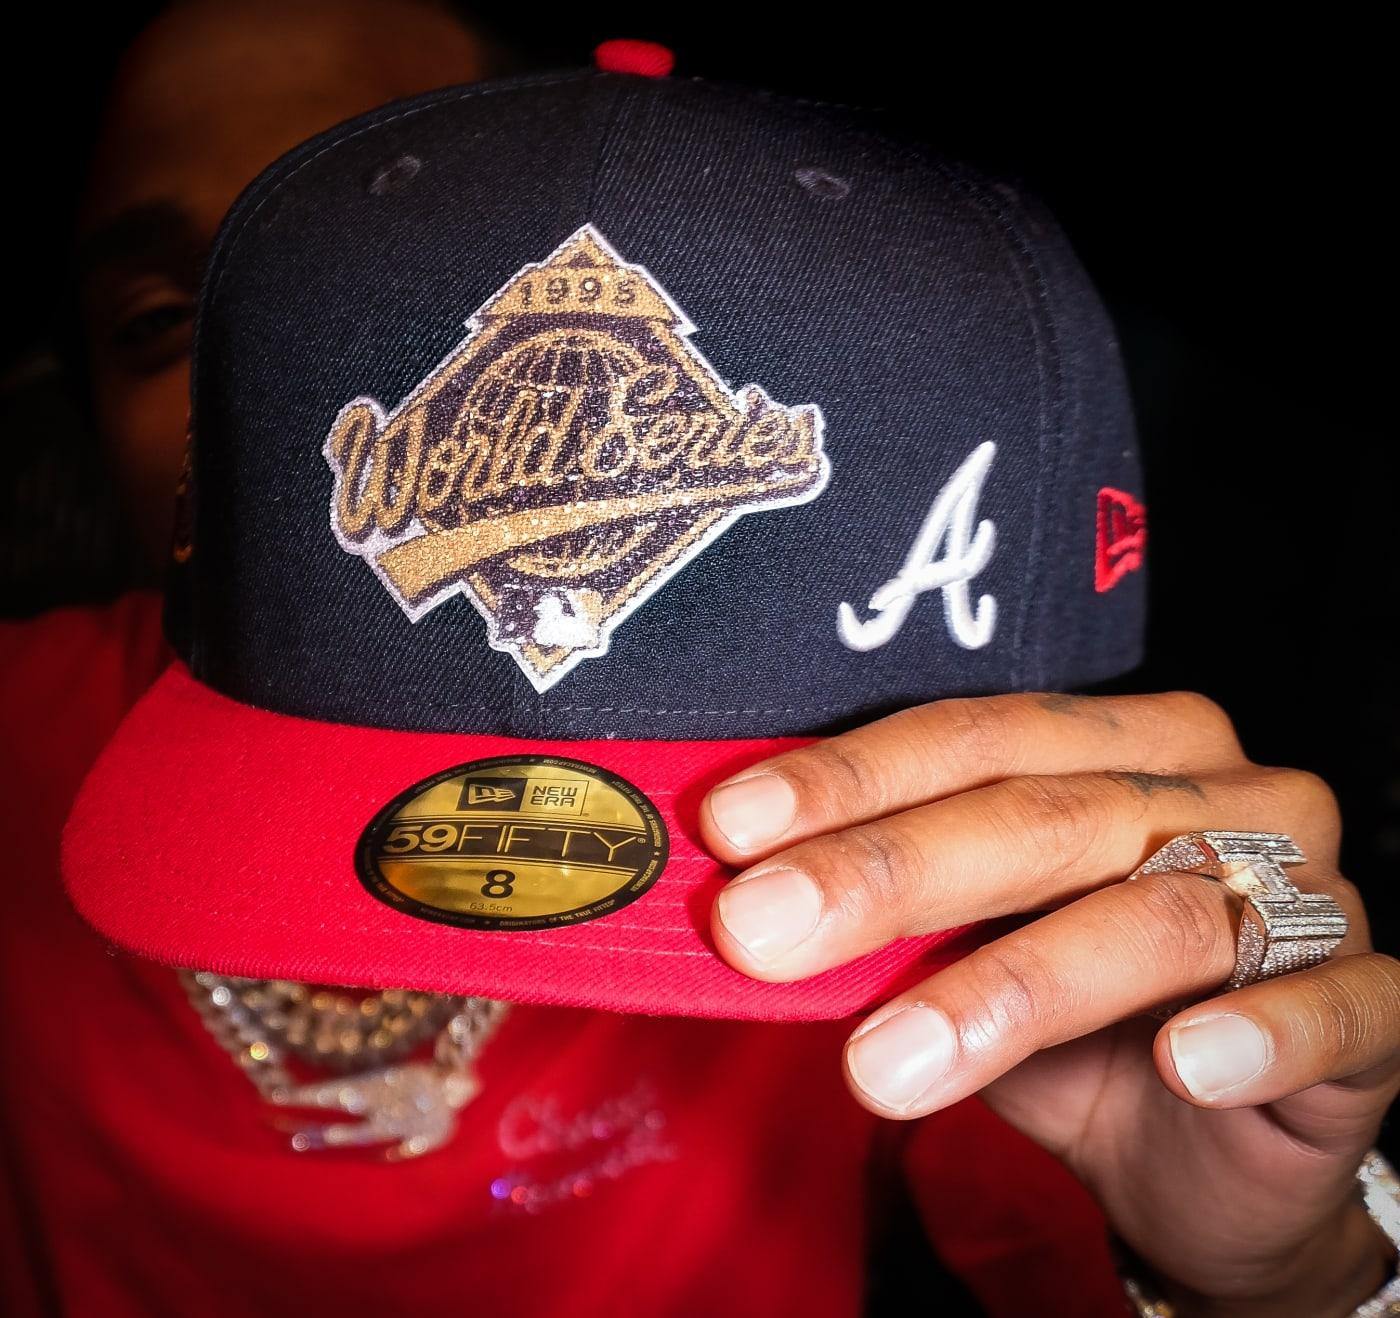 Quavo x Lids x New Era 59Fifty Atlanta Braves 1